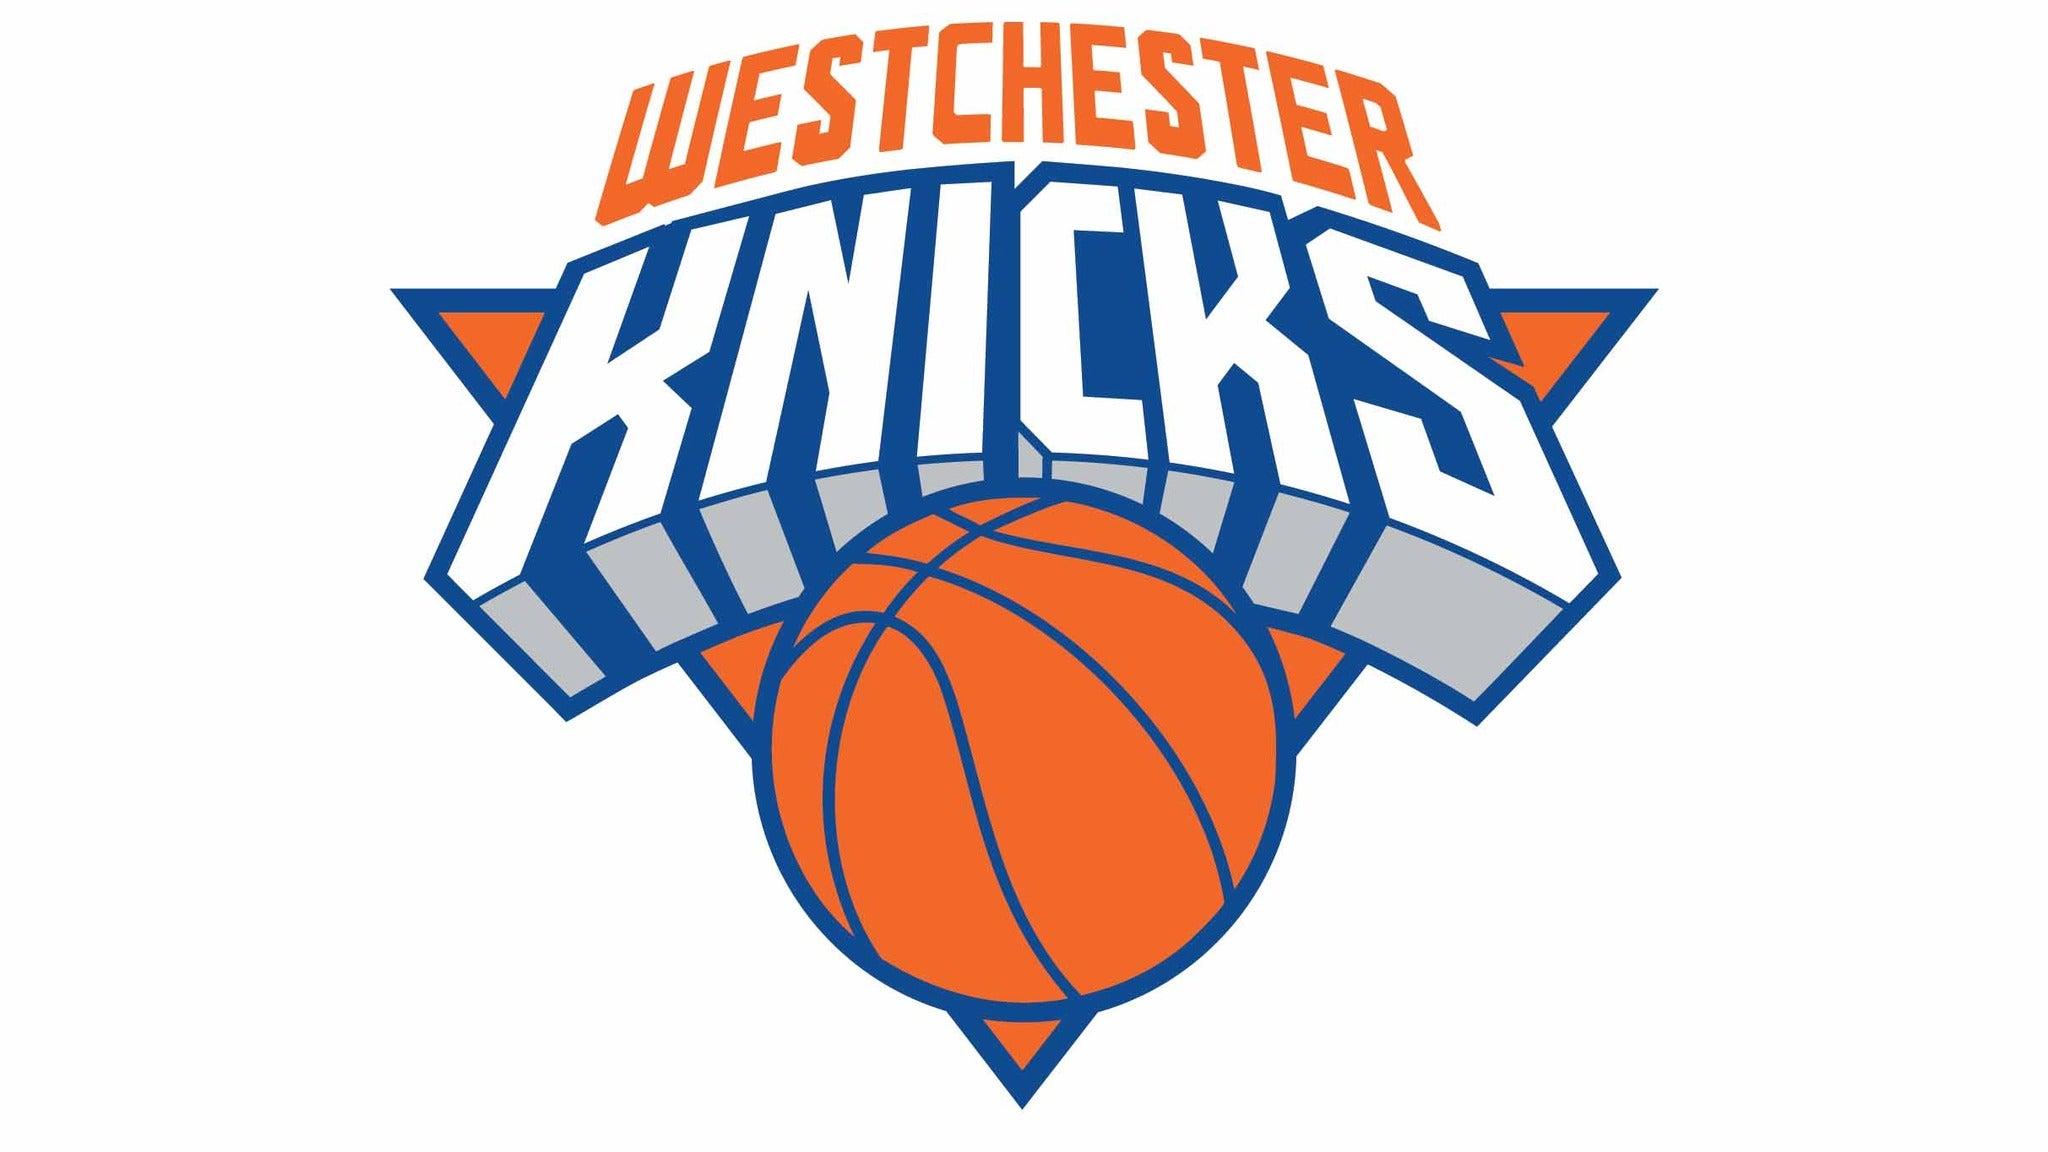 Westchester Knicks vs. Erie Bayhawks February 26, 2017 at ...